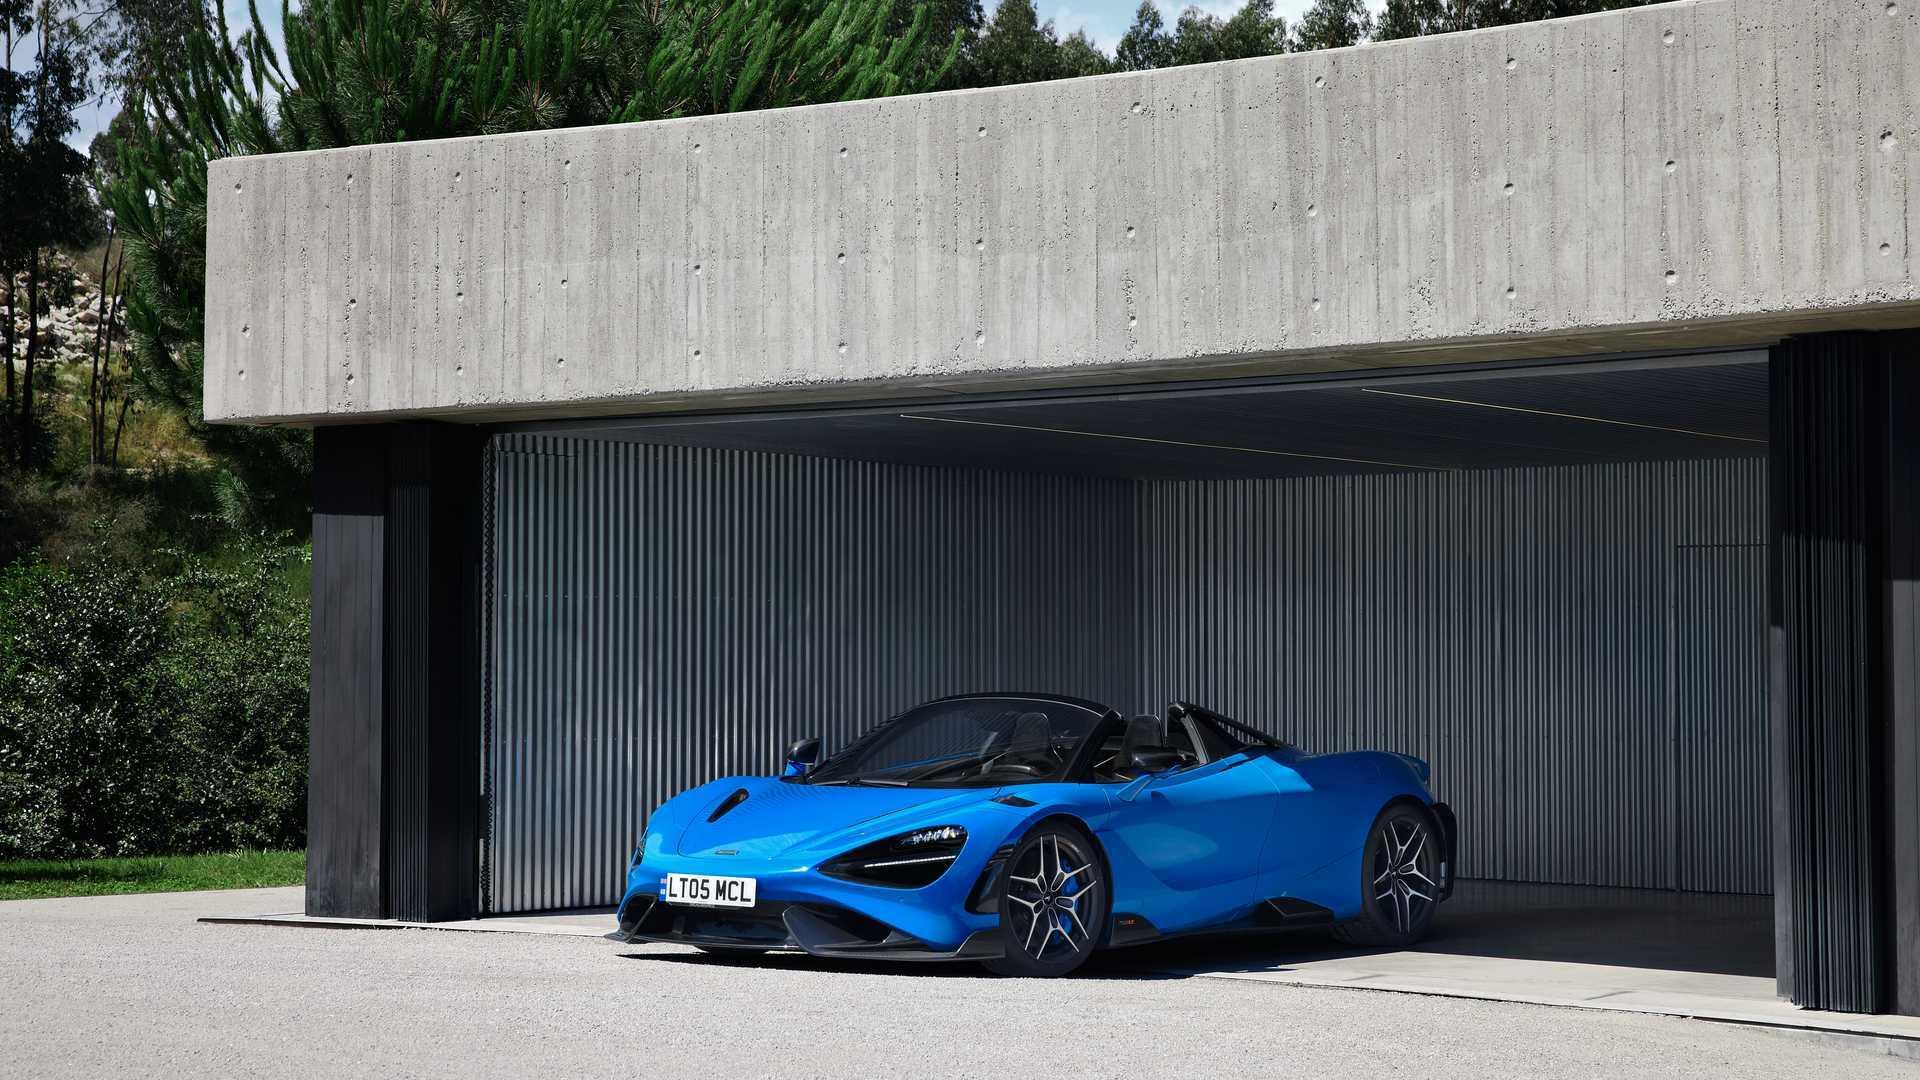 2021 McLaren 765LT Spider